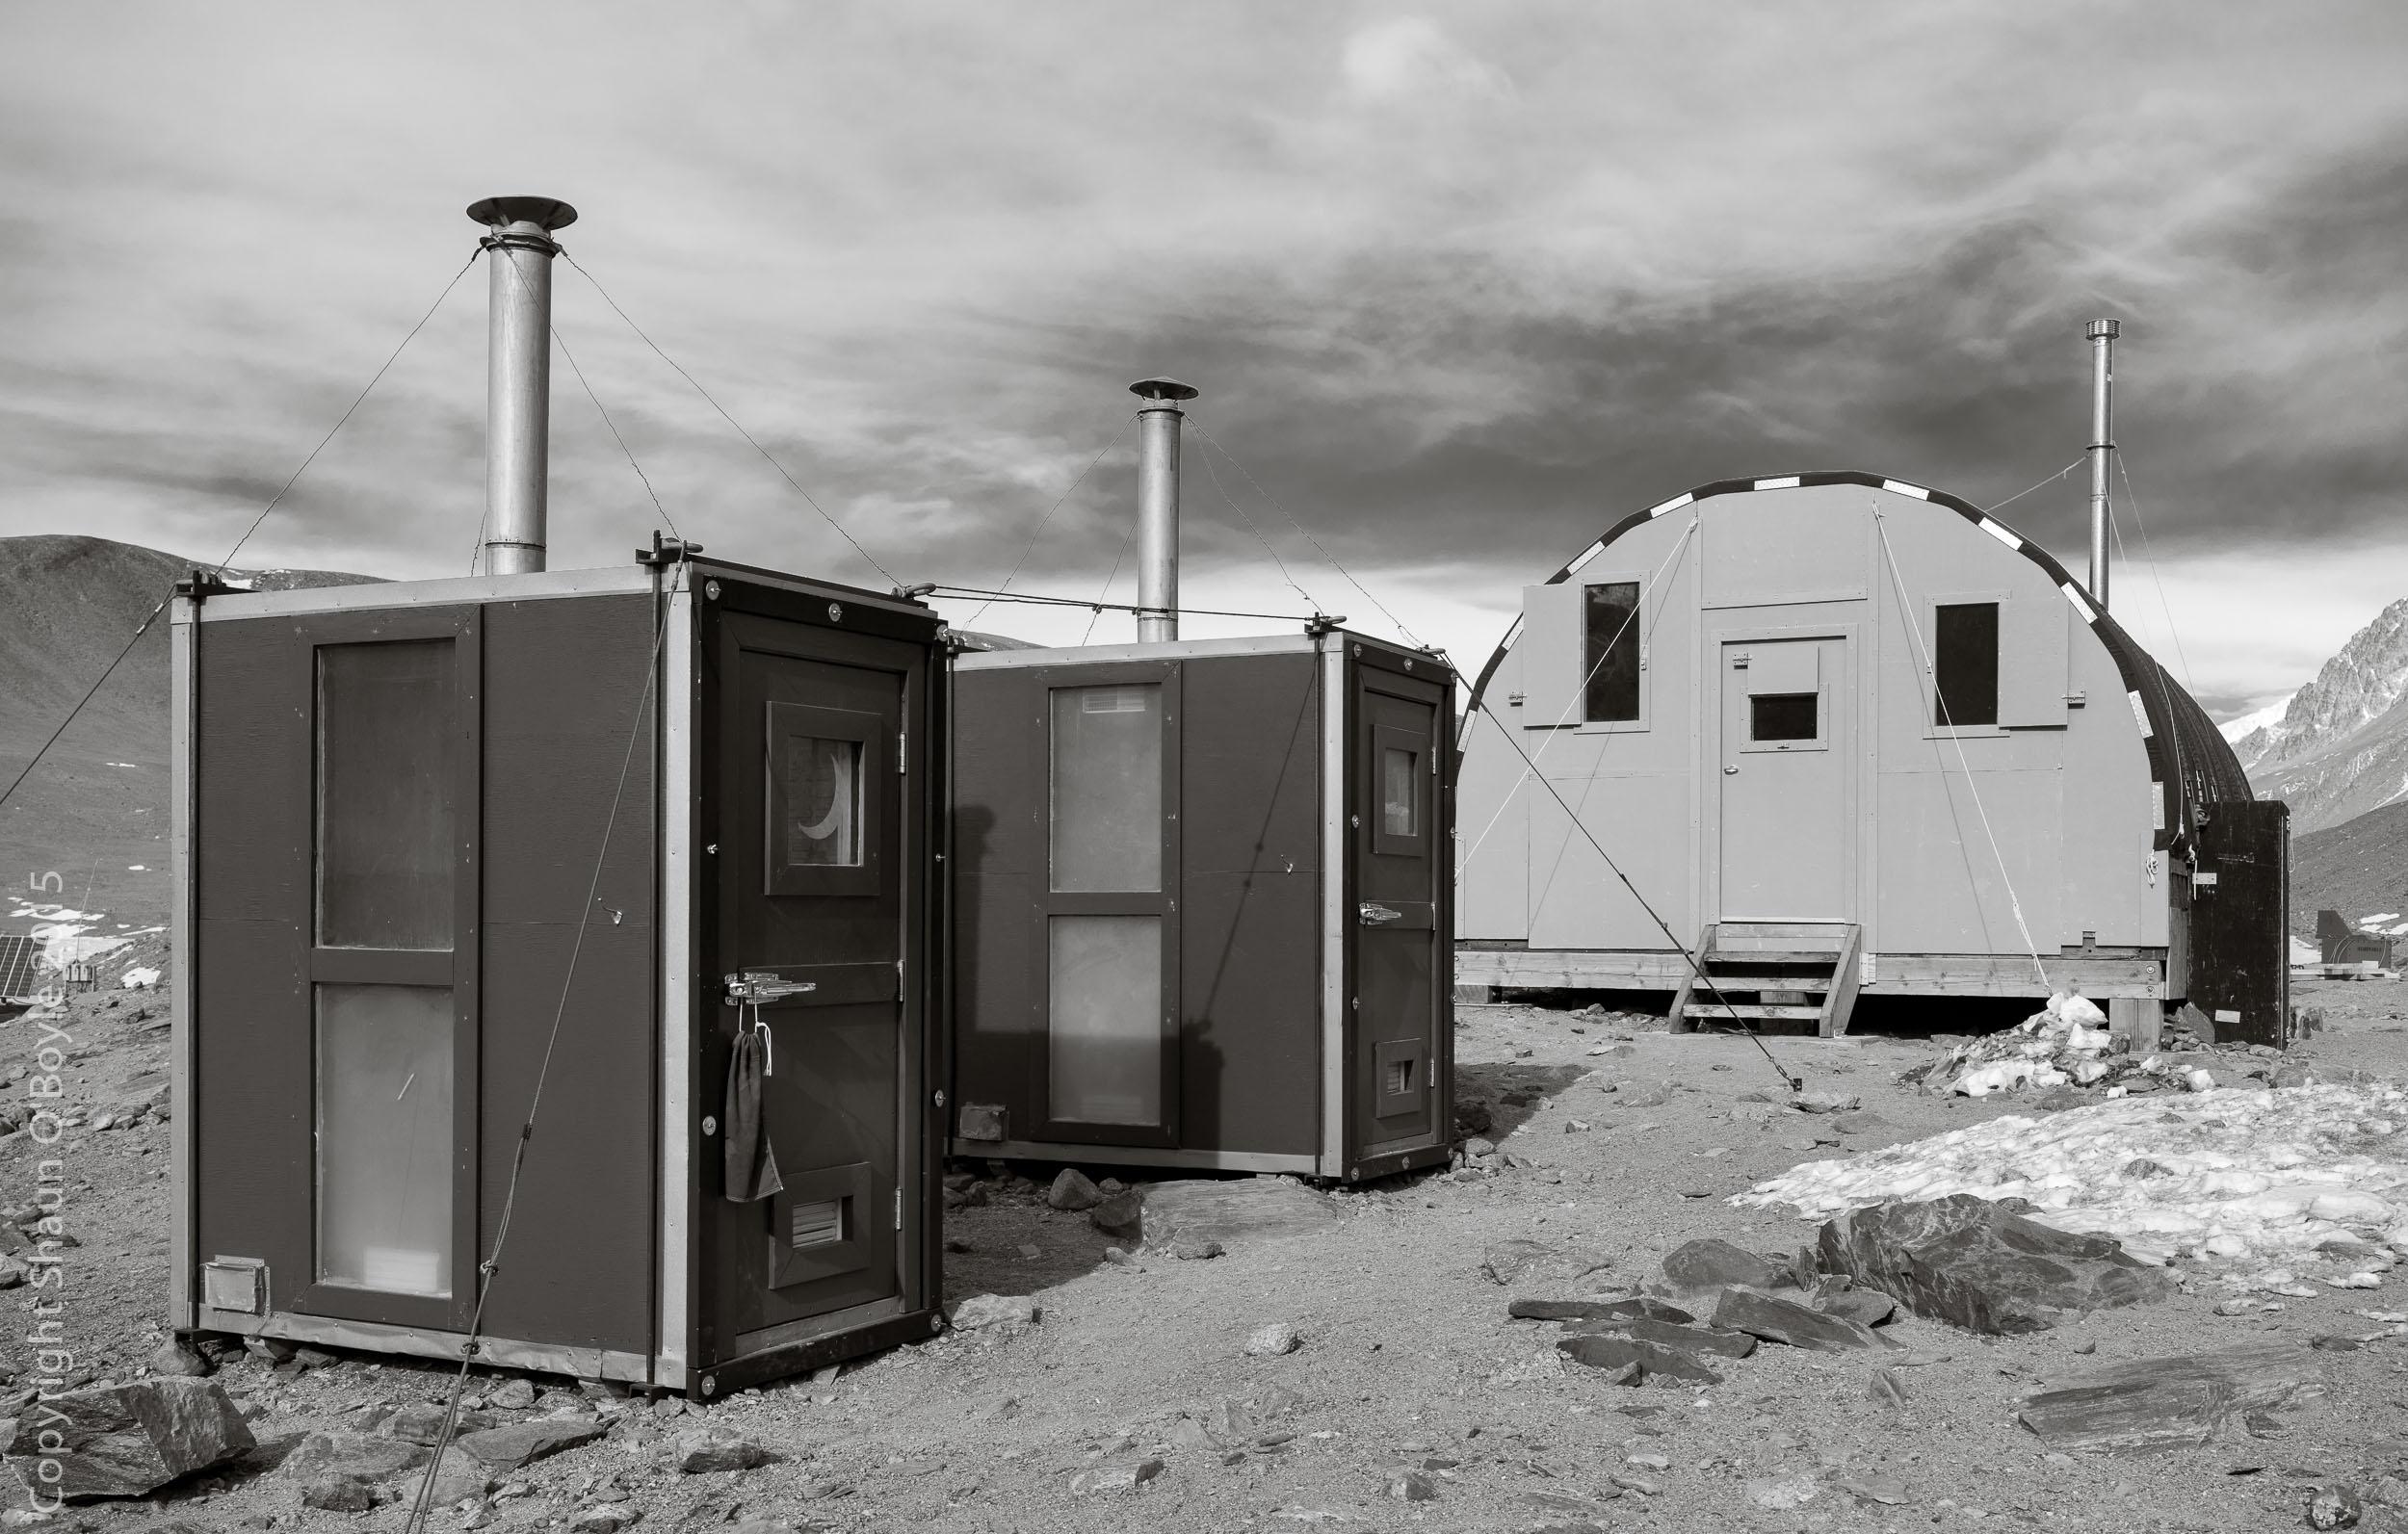 Rocket Toilets at Lake Hoare Station.